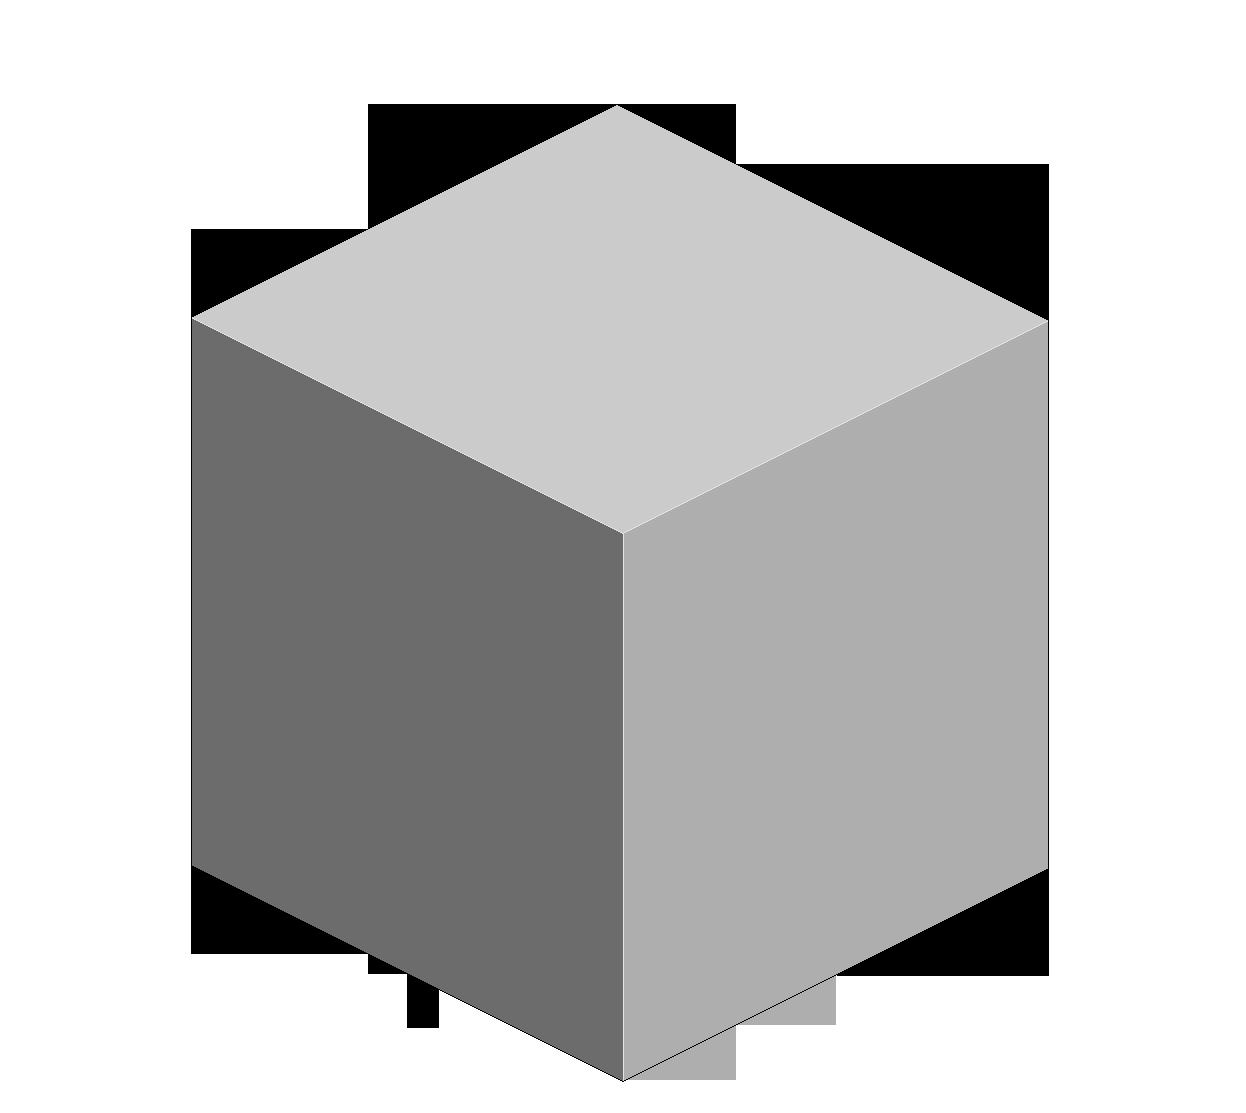 Png hd mart. Cube clipart cube shape